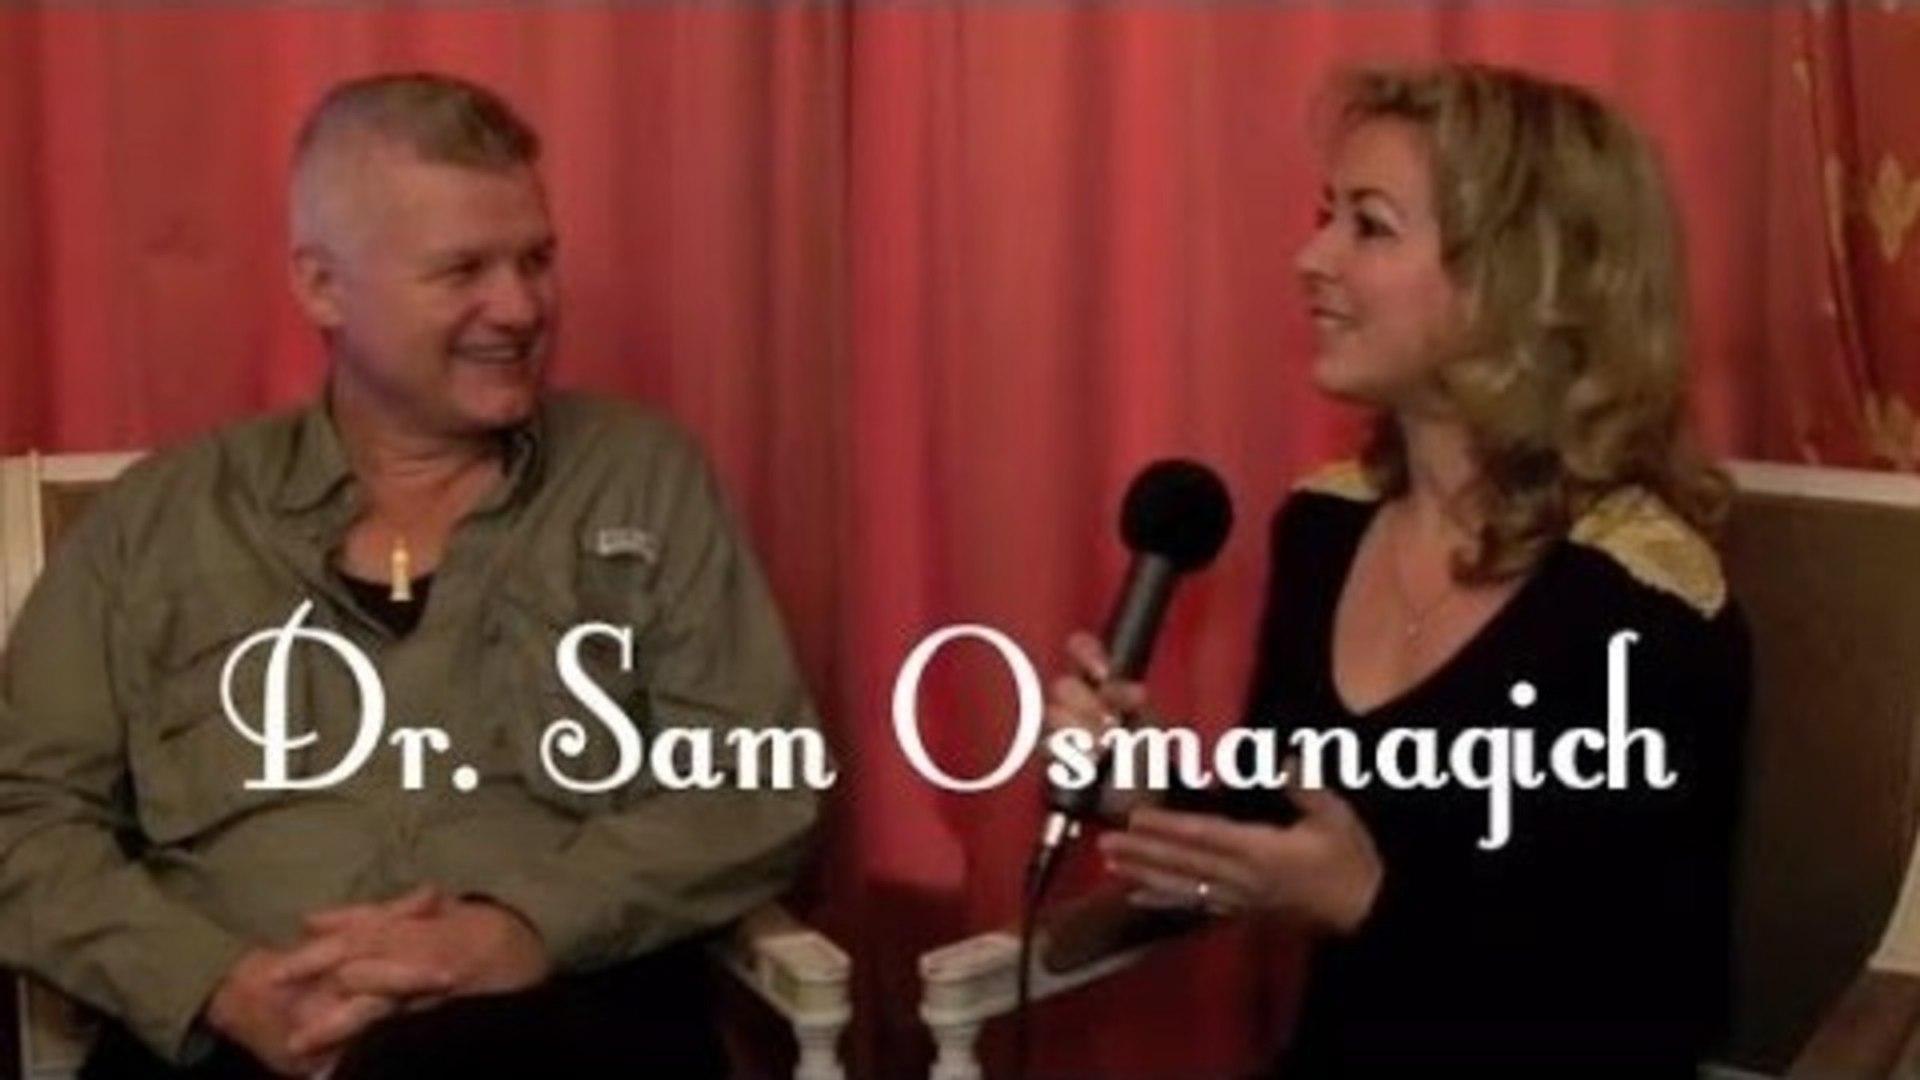 Dr. Sam Osmanagich about the Bosnian Pyramids